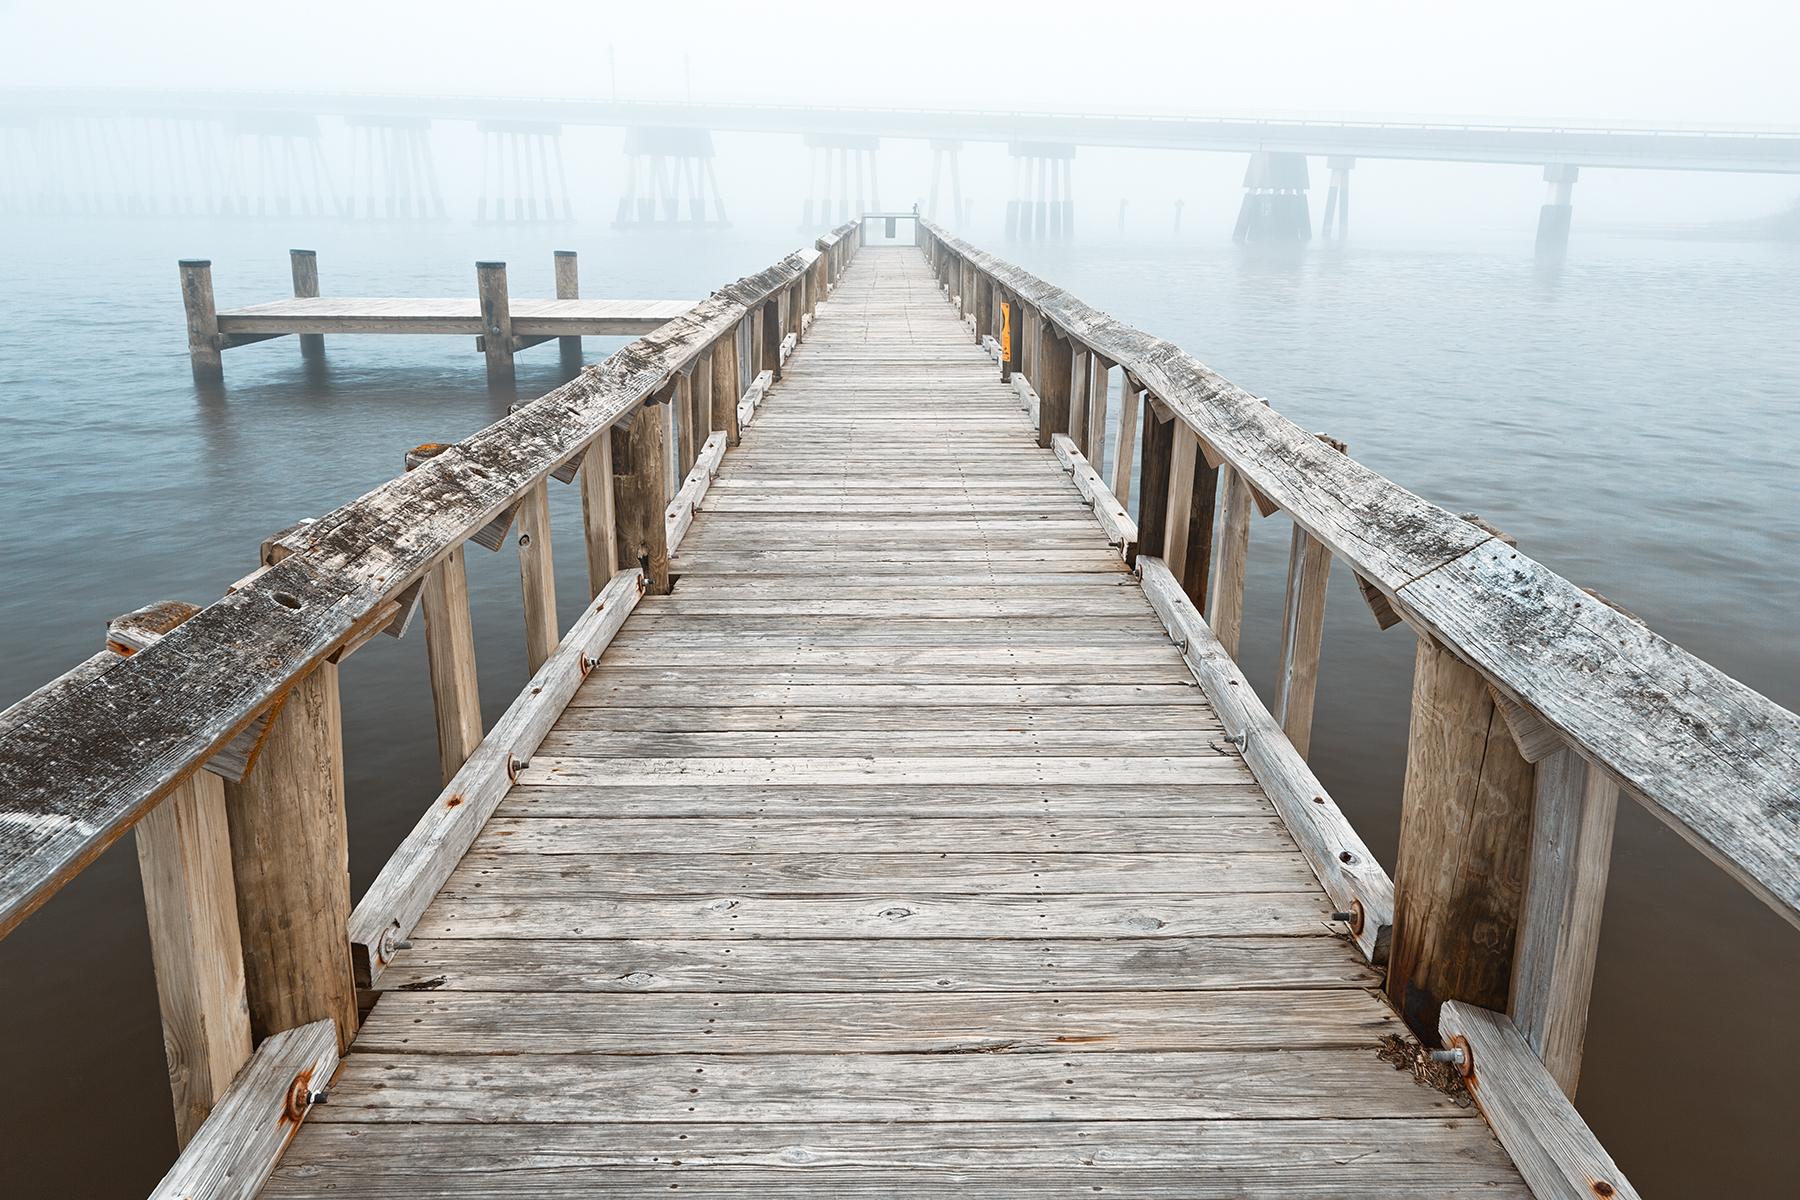 Misty assateague pier - high key hdr photo